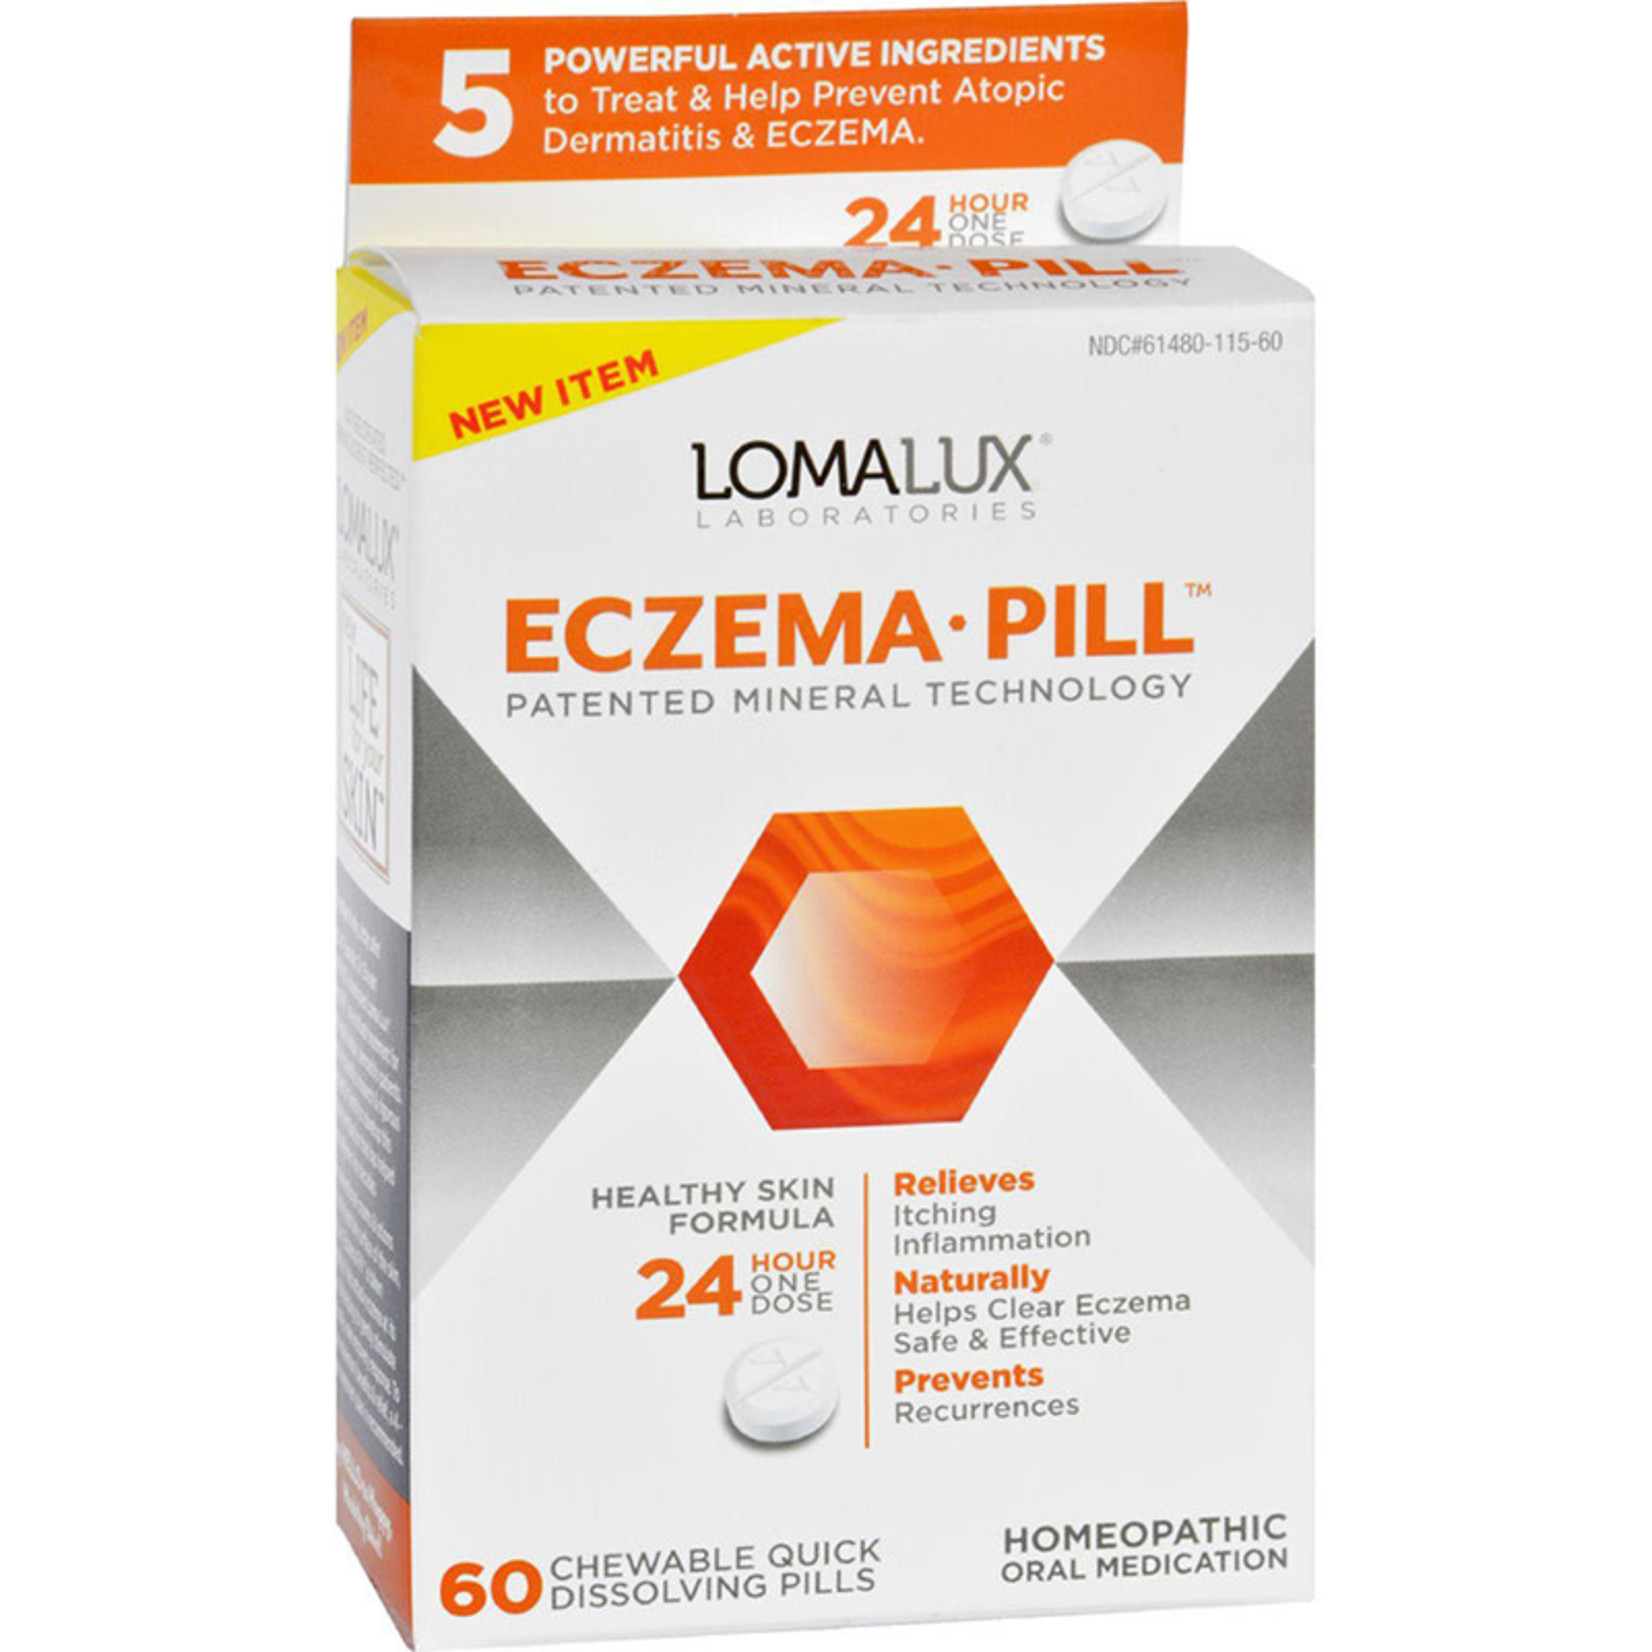 Loma Lux Eczema Pill